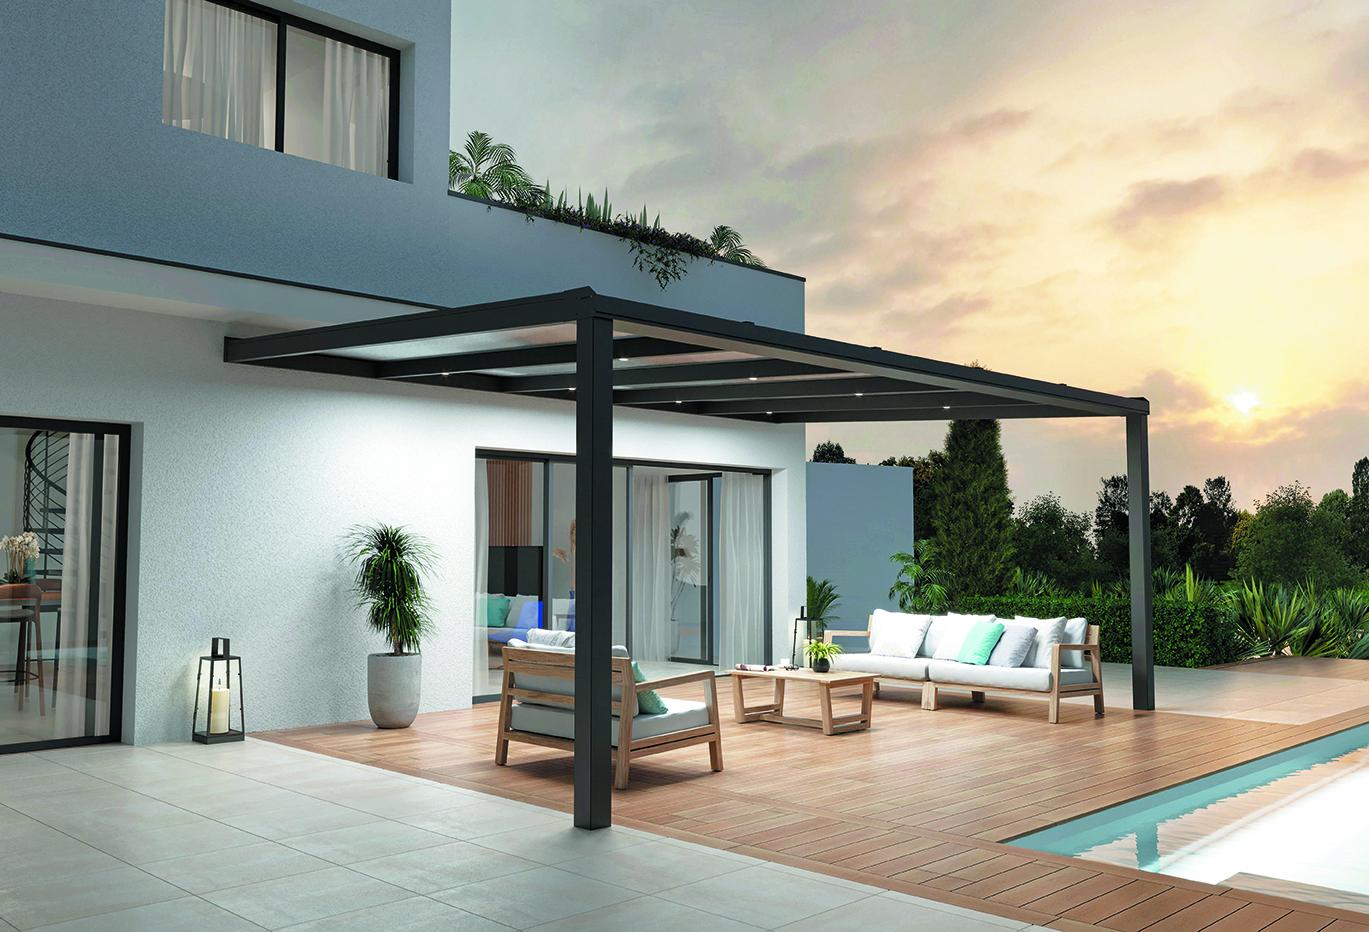 Pergola aluminium Skybox